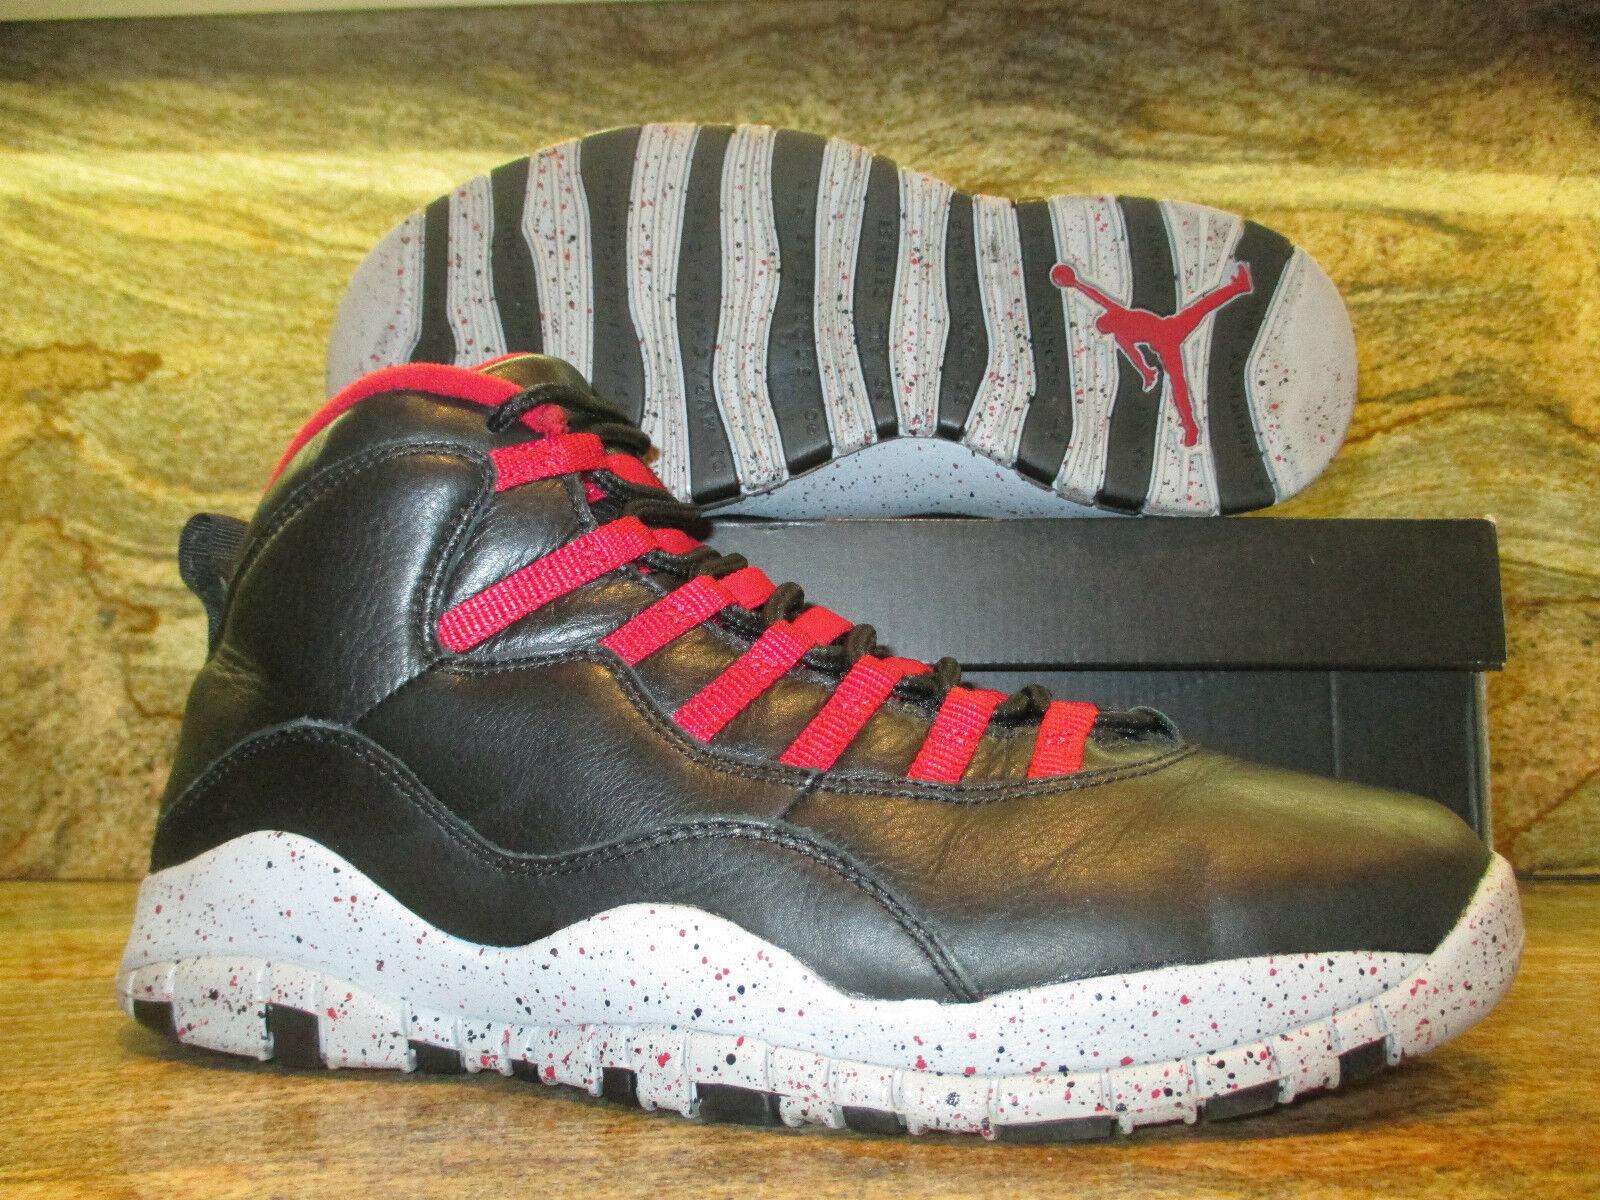 Nike Air Jordan 10 X Retro Promo Sample SZ 10.5 PSNY Black Public School FNF PE